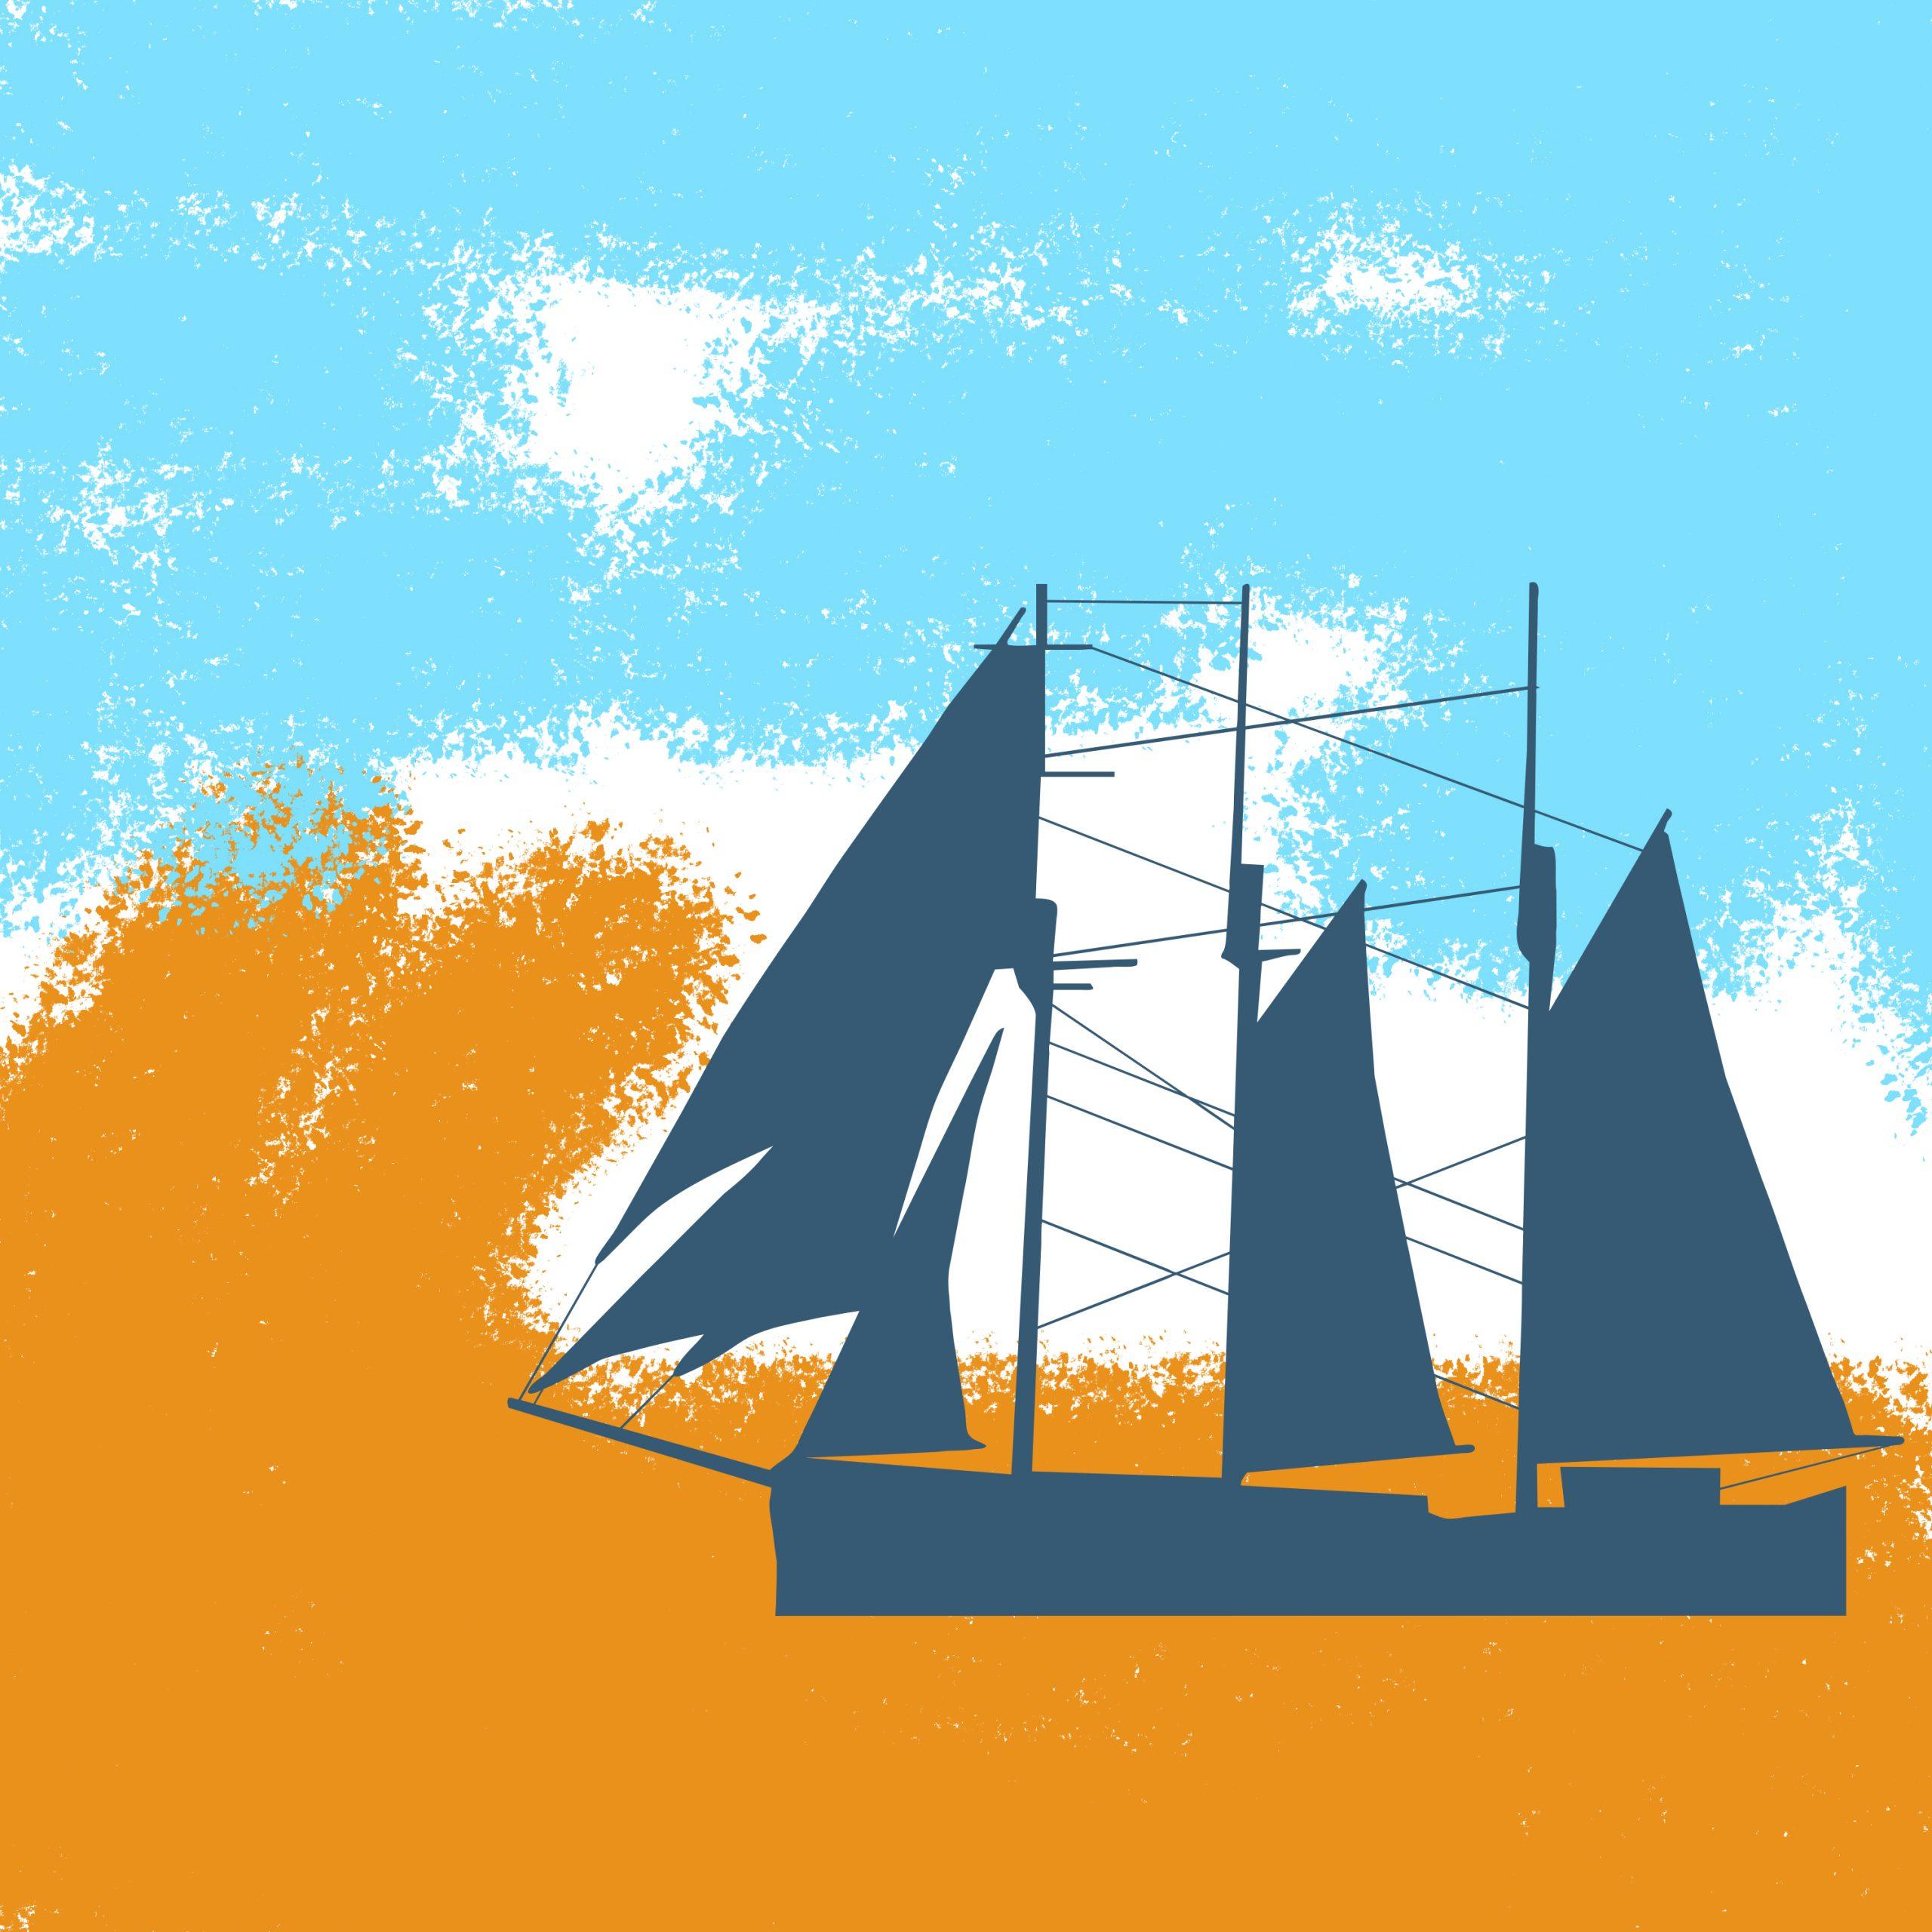 A boat illustration